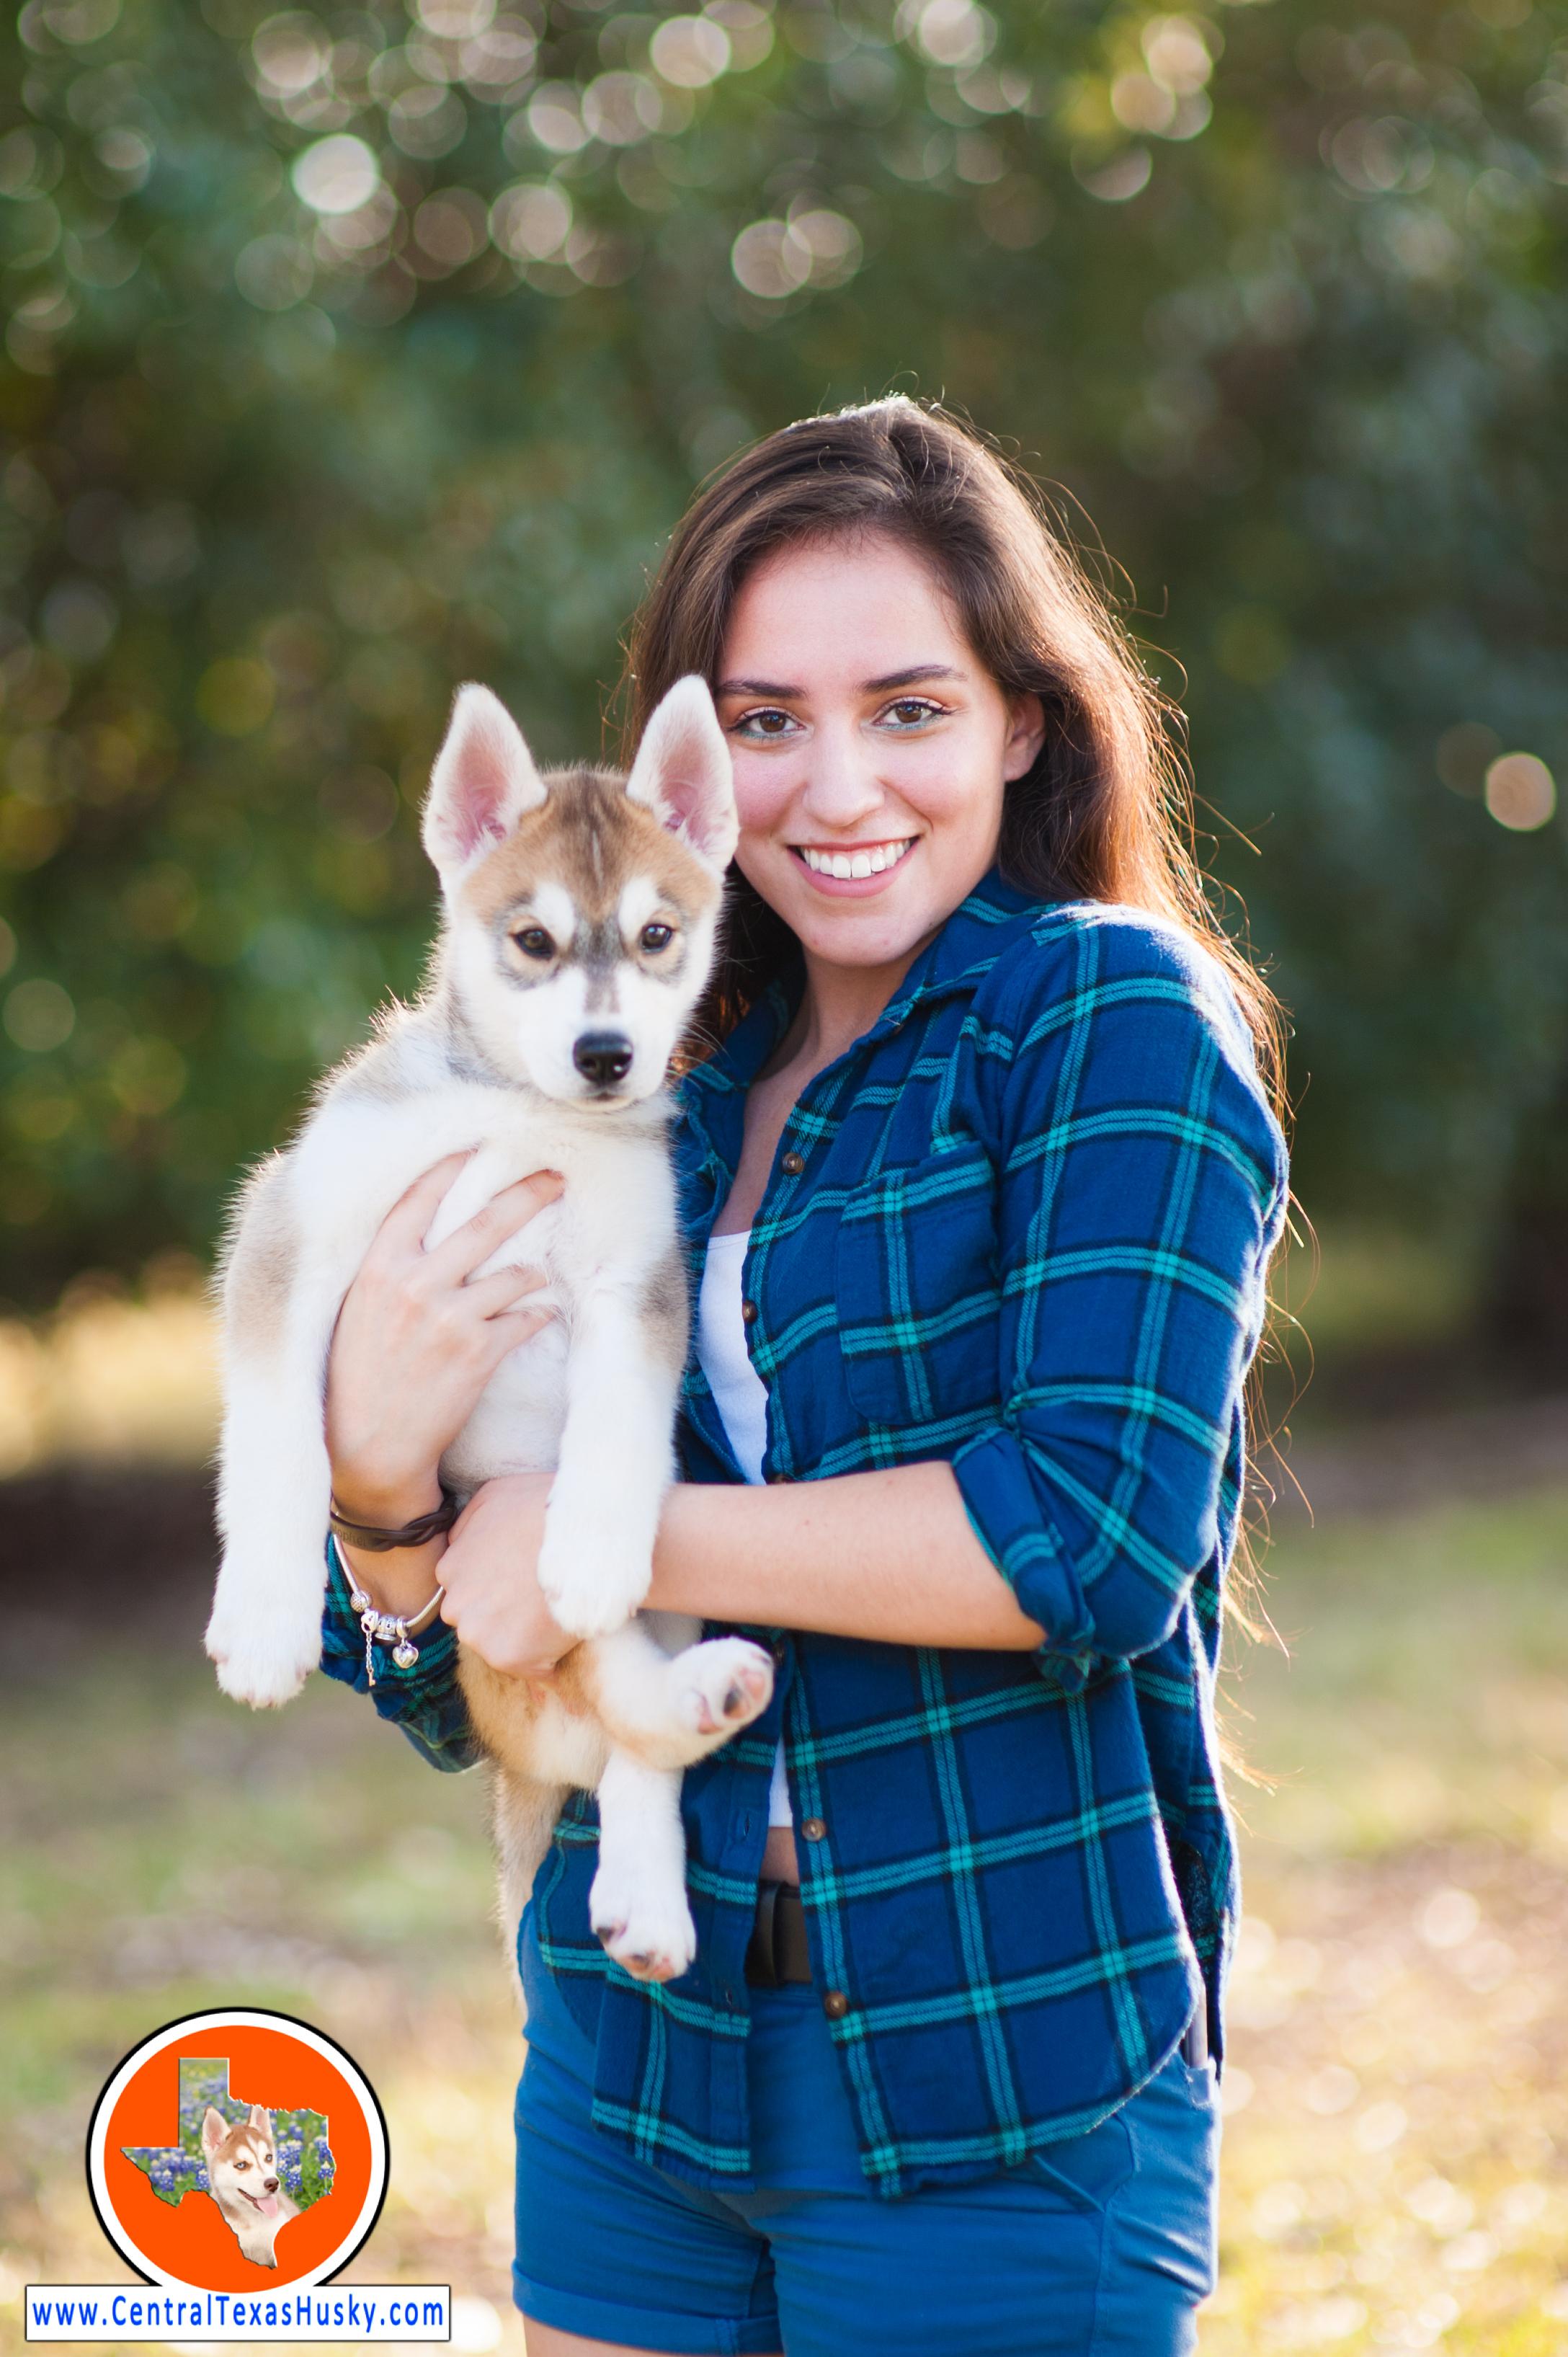 central-texas-husky_austin-siberian-husky-breeder_702621_20171104